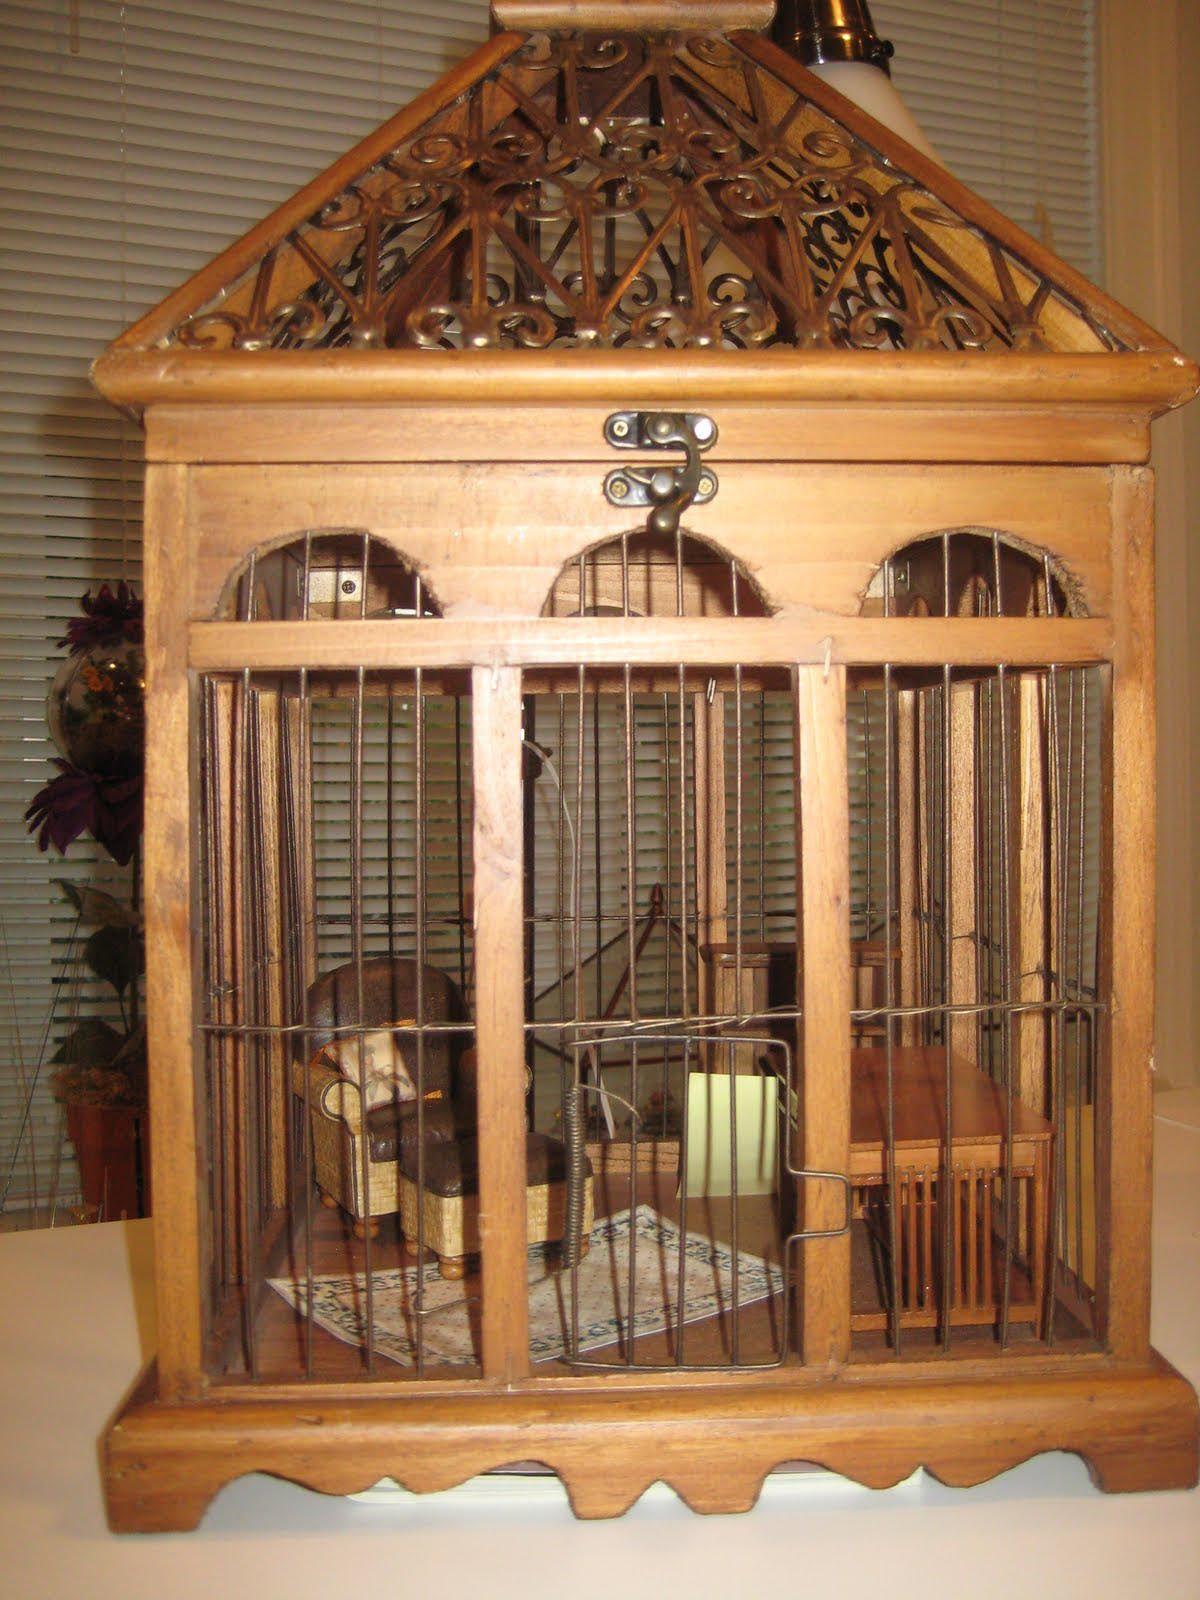 DIY Bird Cage Plans | Diy bird cage, Wooden bird, Bird cage